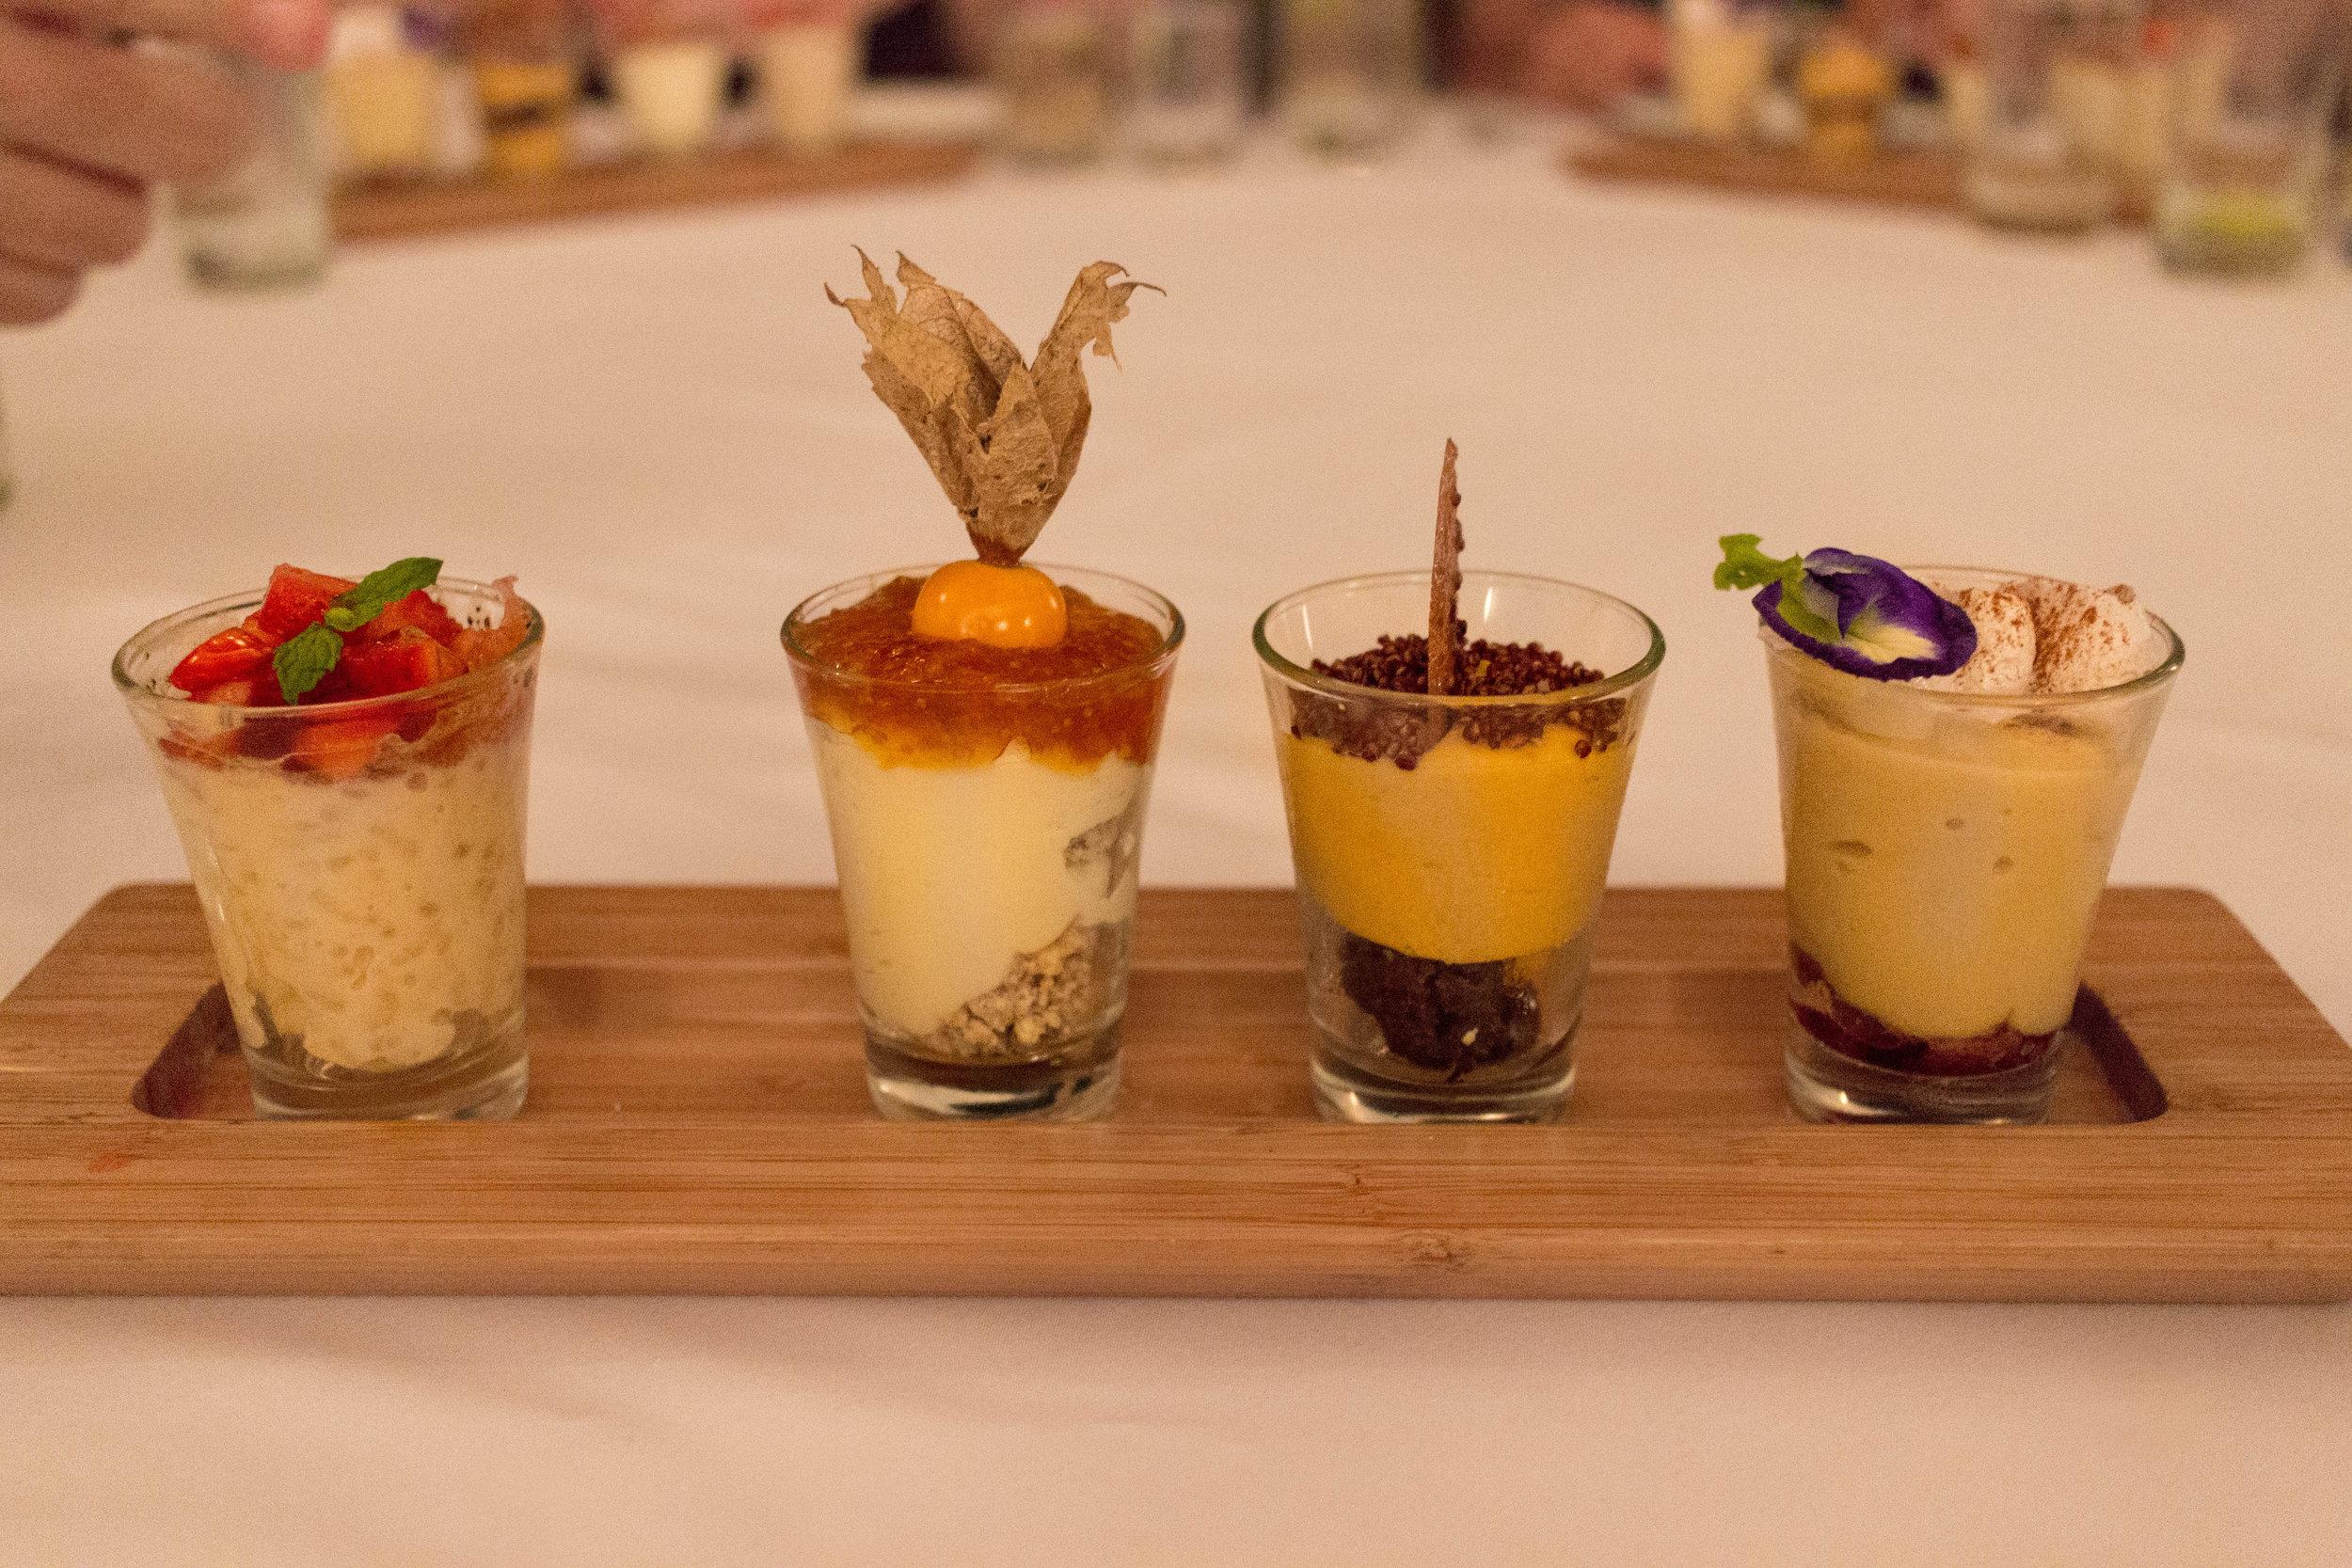 The elegant dessert.